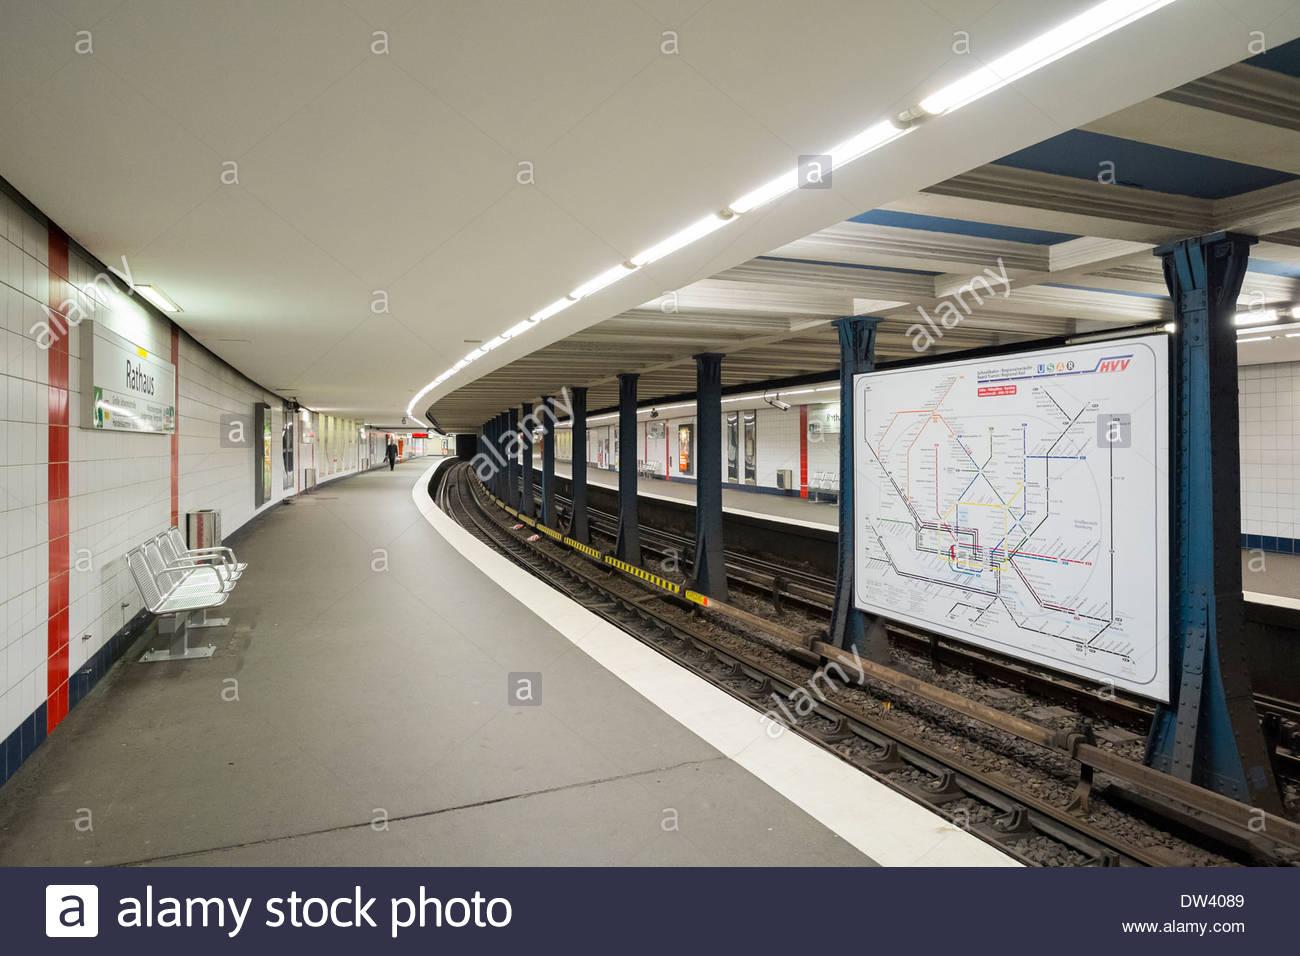 Hamburg U-Bahn (metro) station at Rathaus station, Hamburg, Germany, Europe Stock Photo